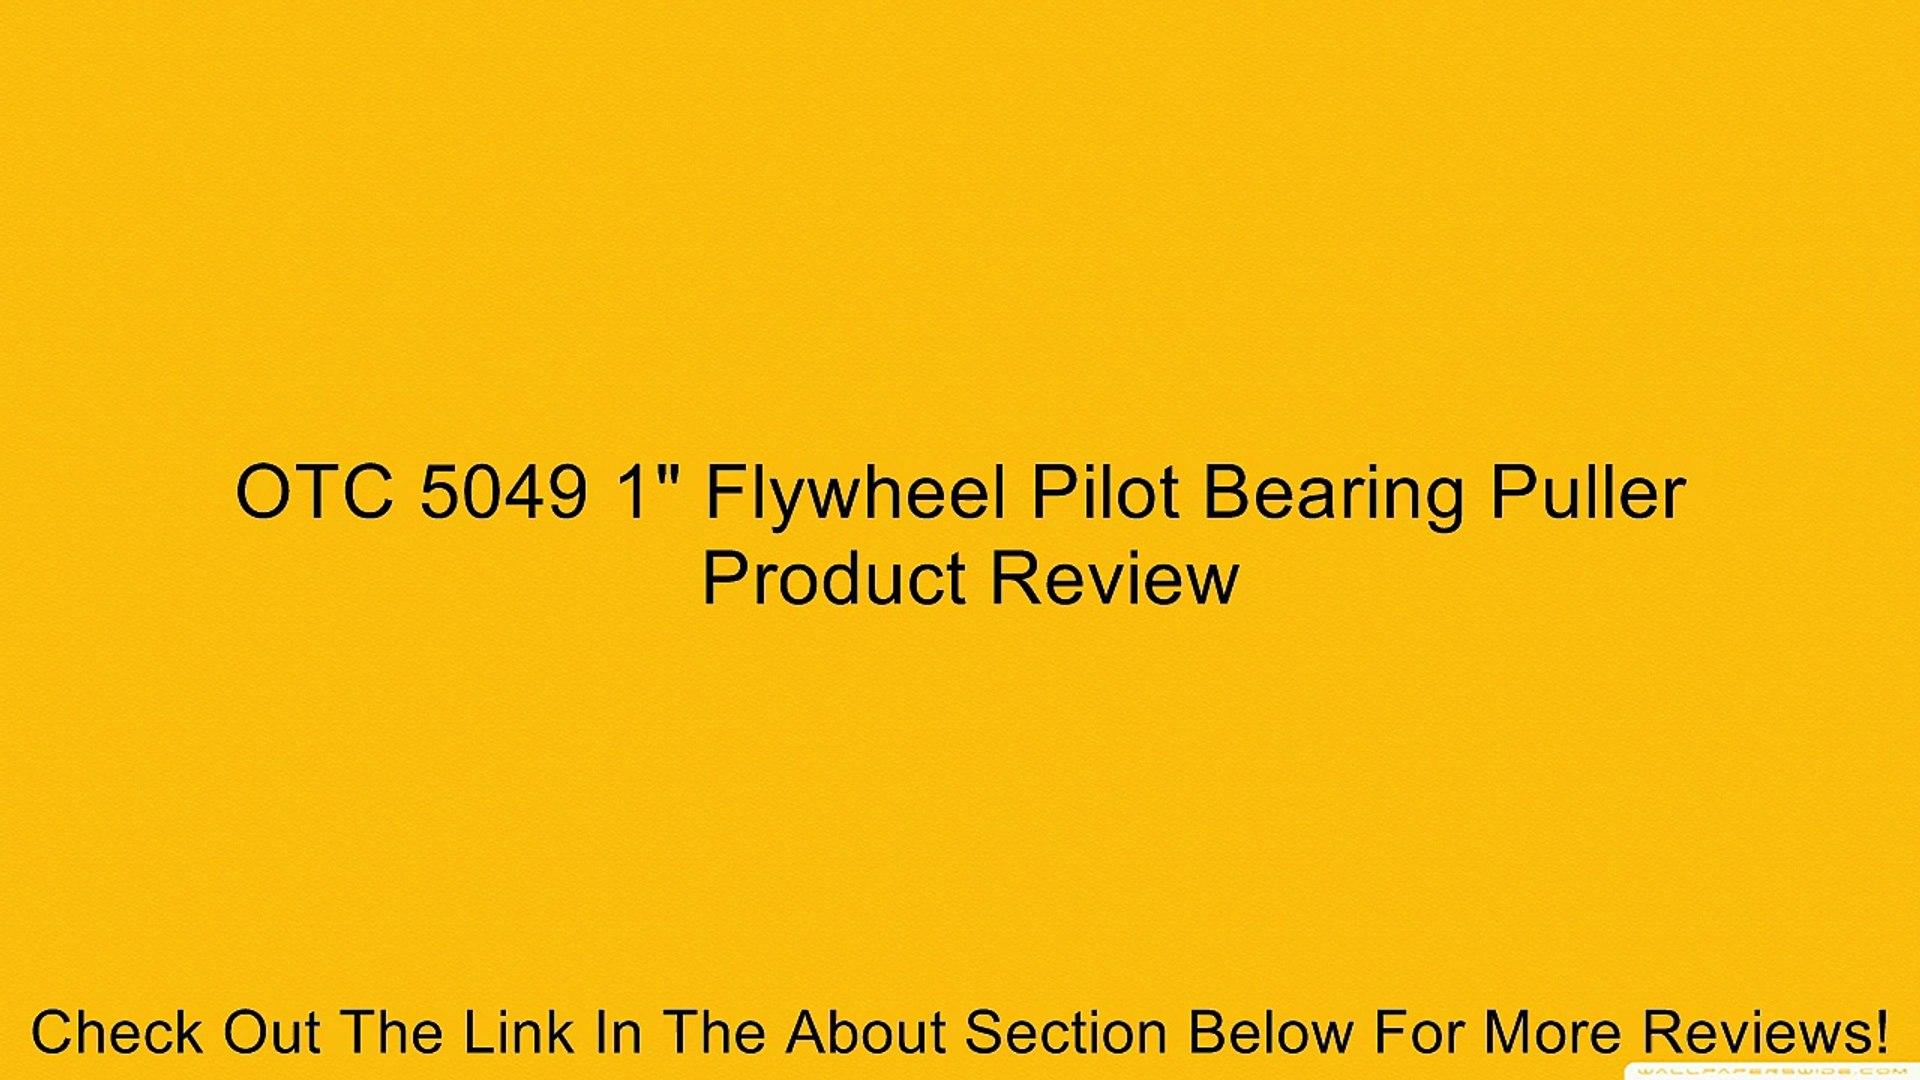 OTC 5049 1 Flywheel Pilot Bearing Puller